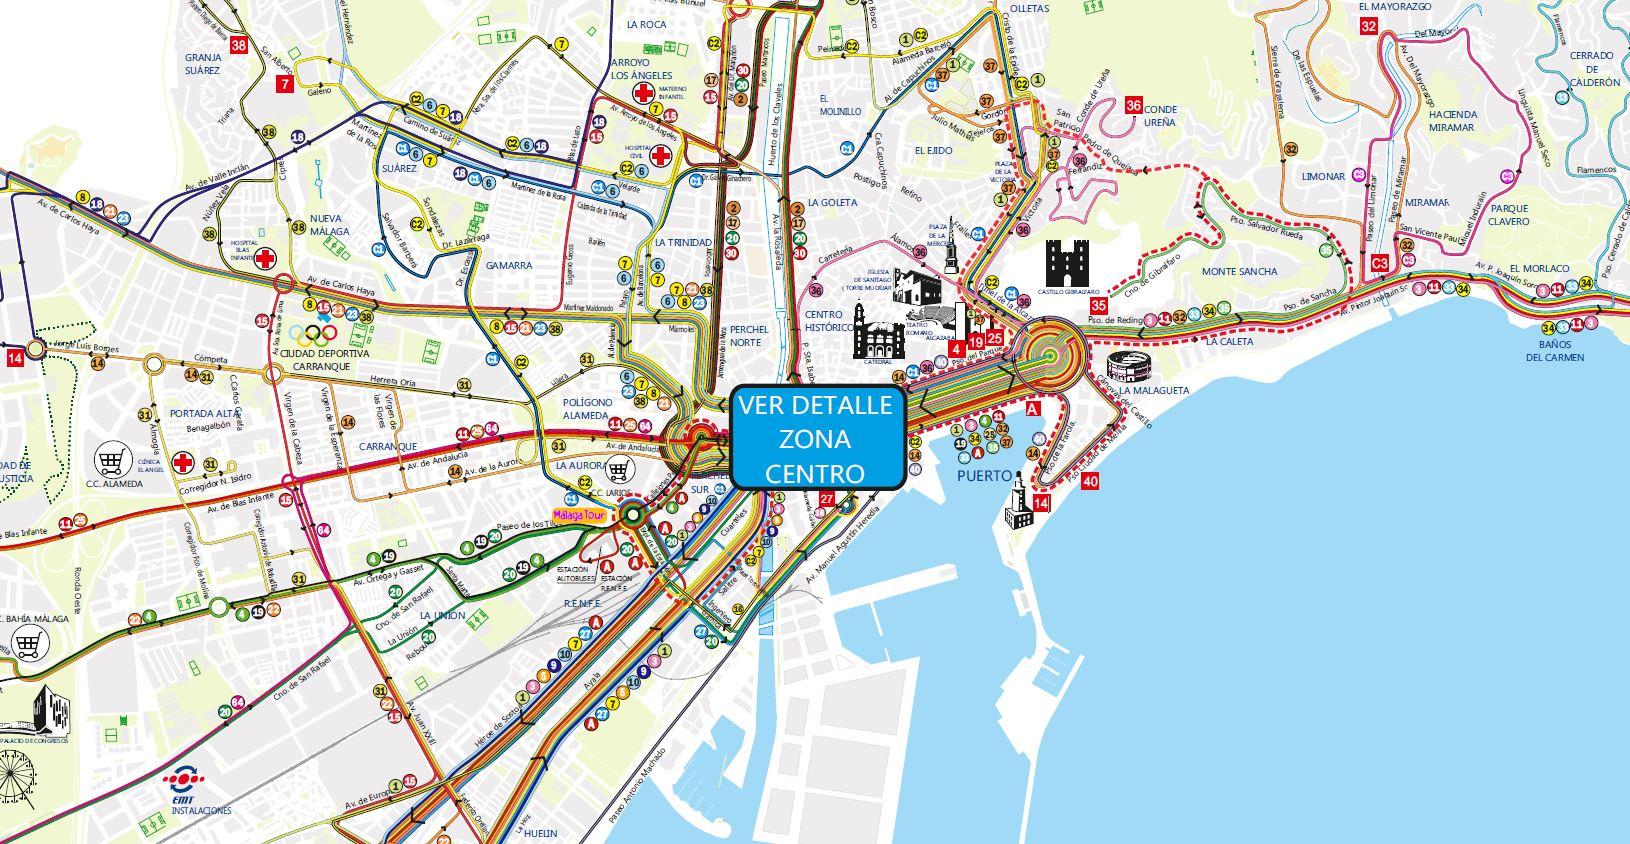 Autobuses-urbanos-malaga-plano